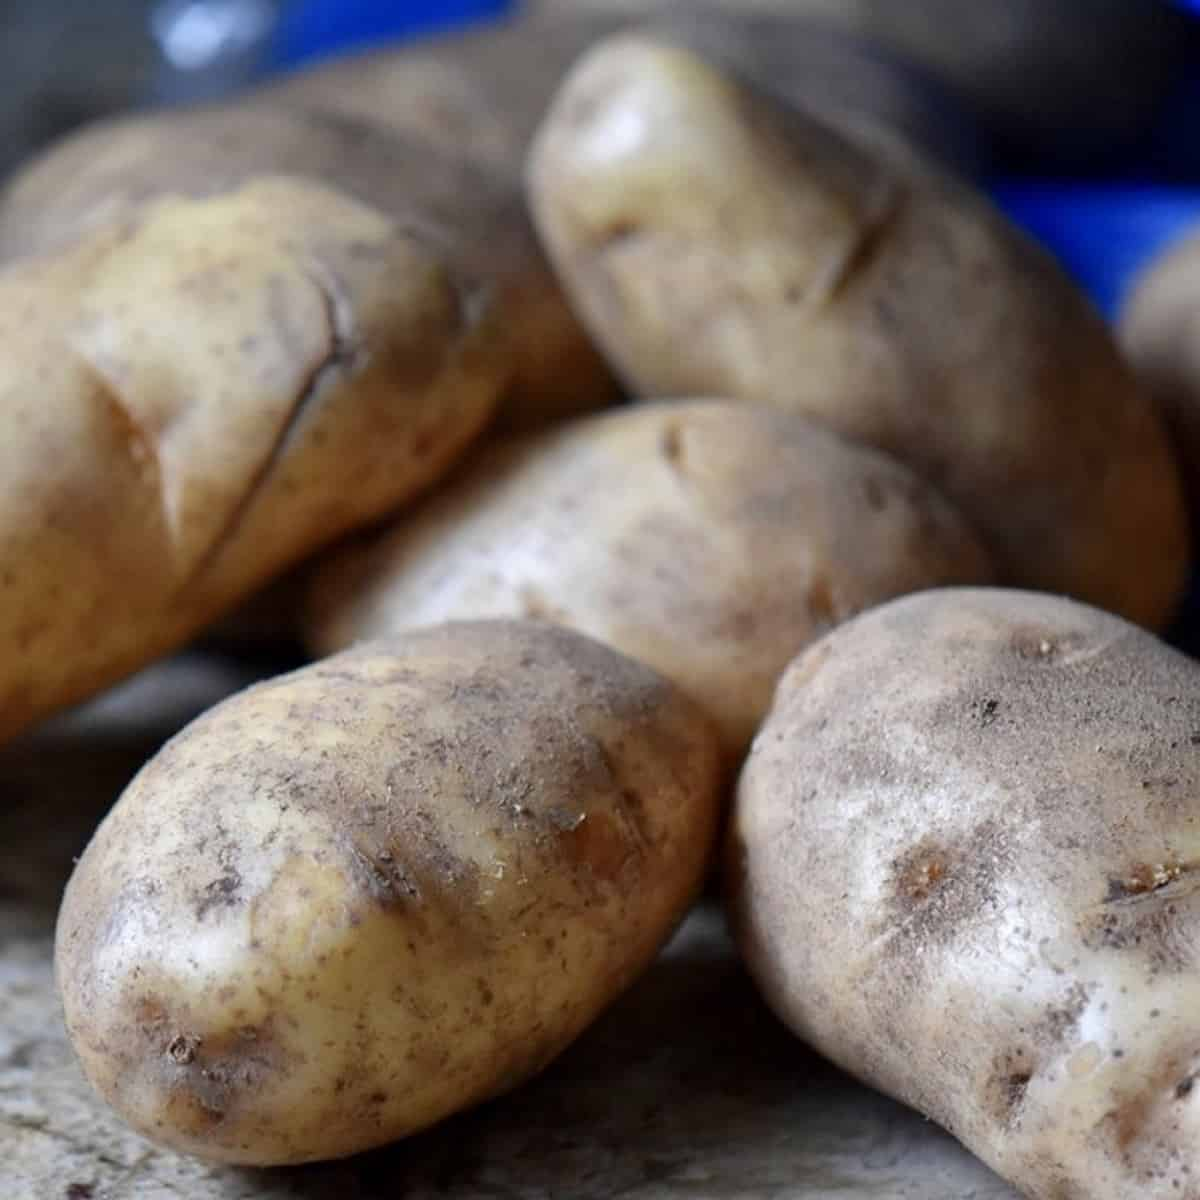 Whole russet potatoes.